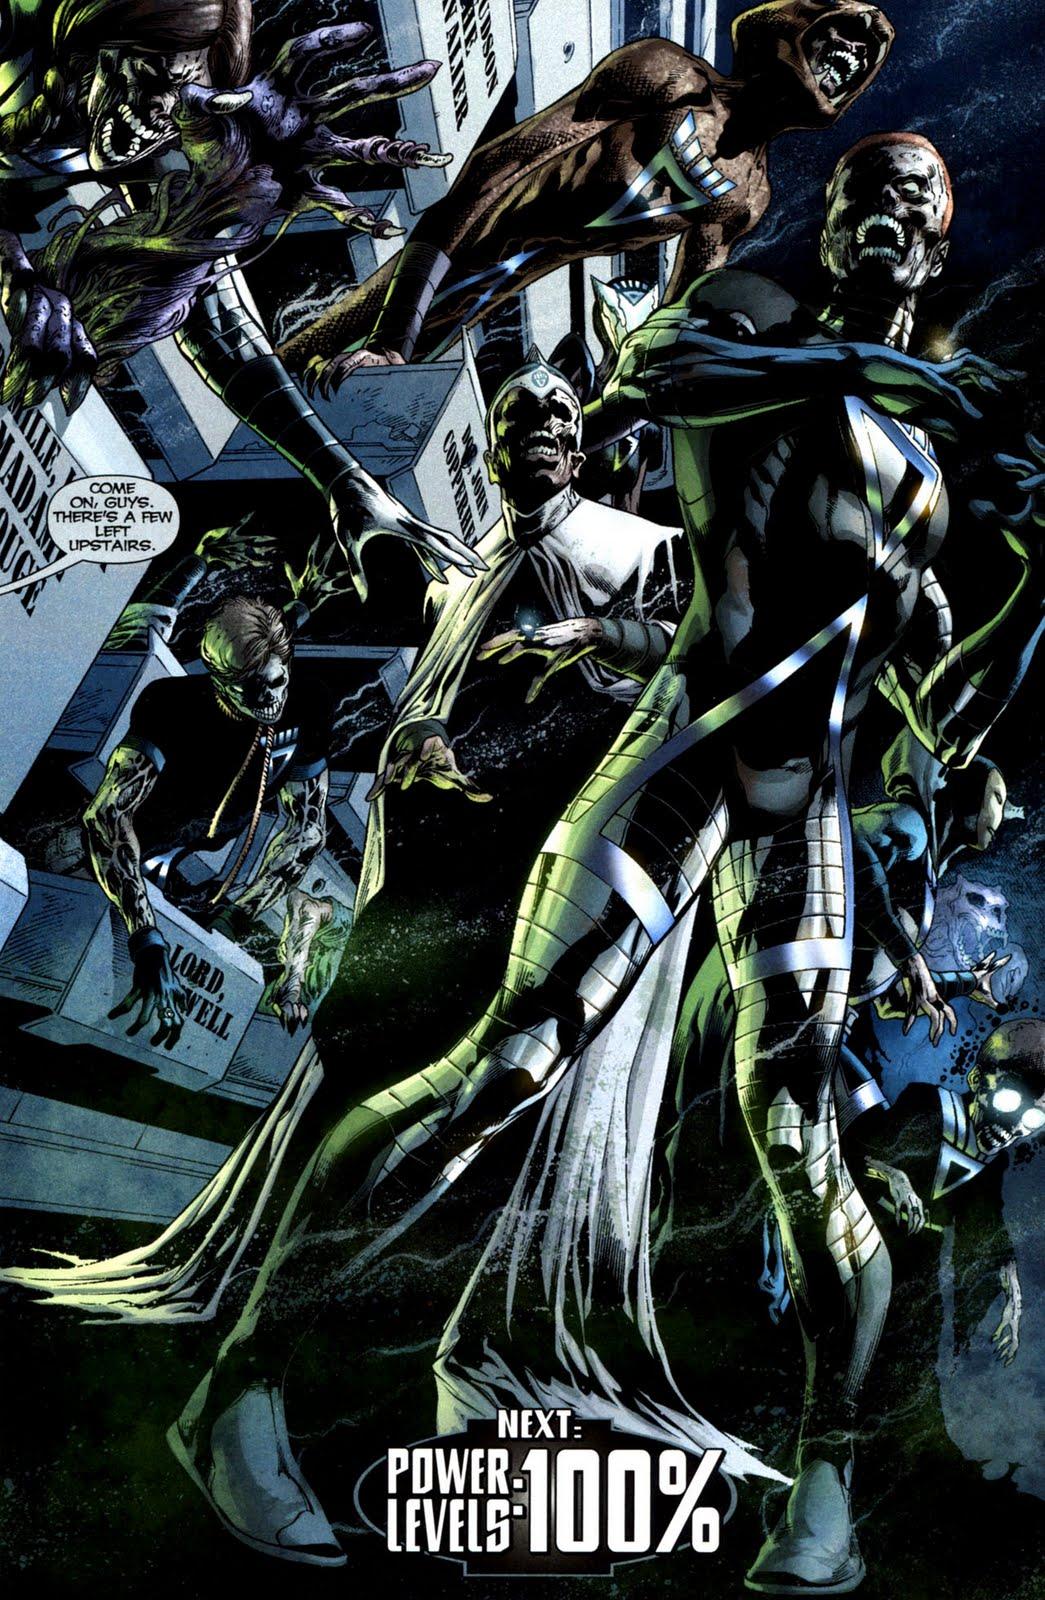 Comicsverse 101 Lanterne Nere E Bianche By Popular Demand